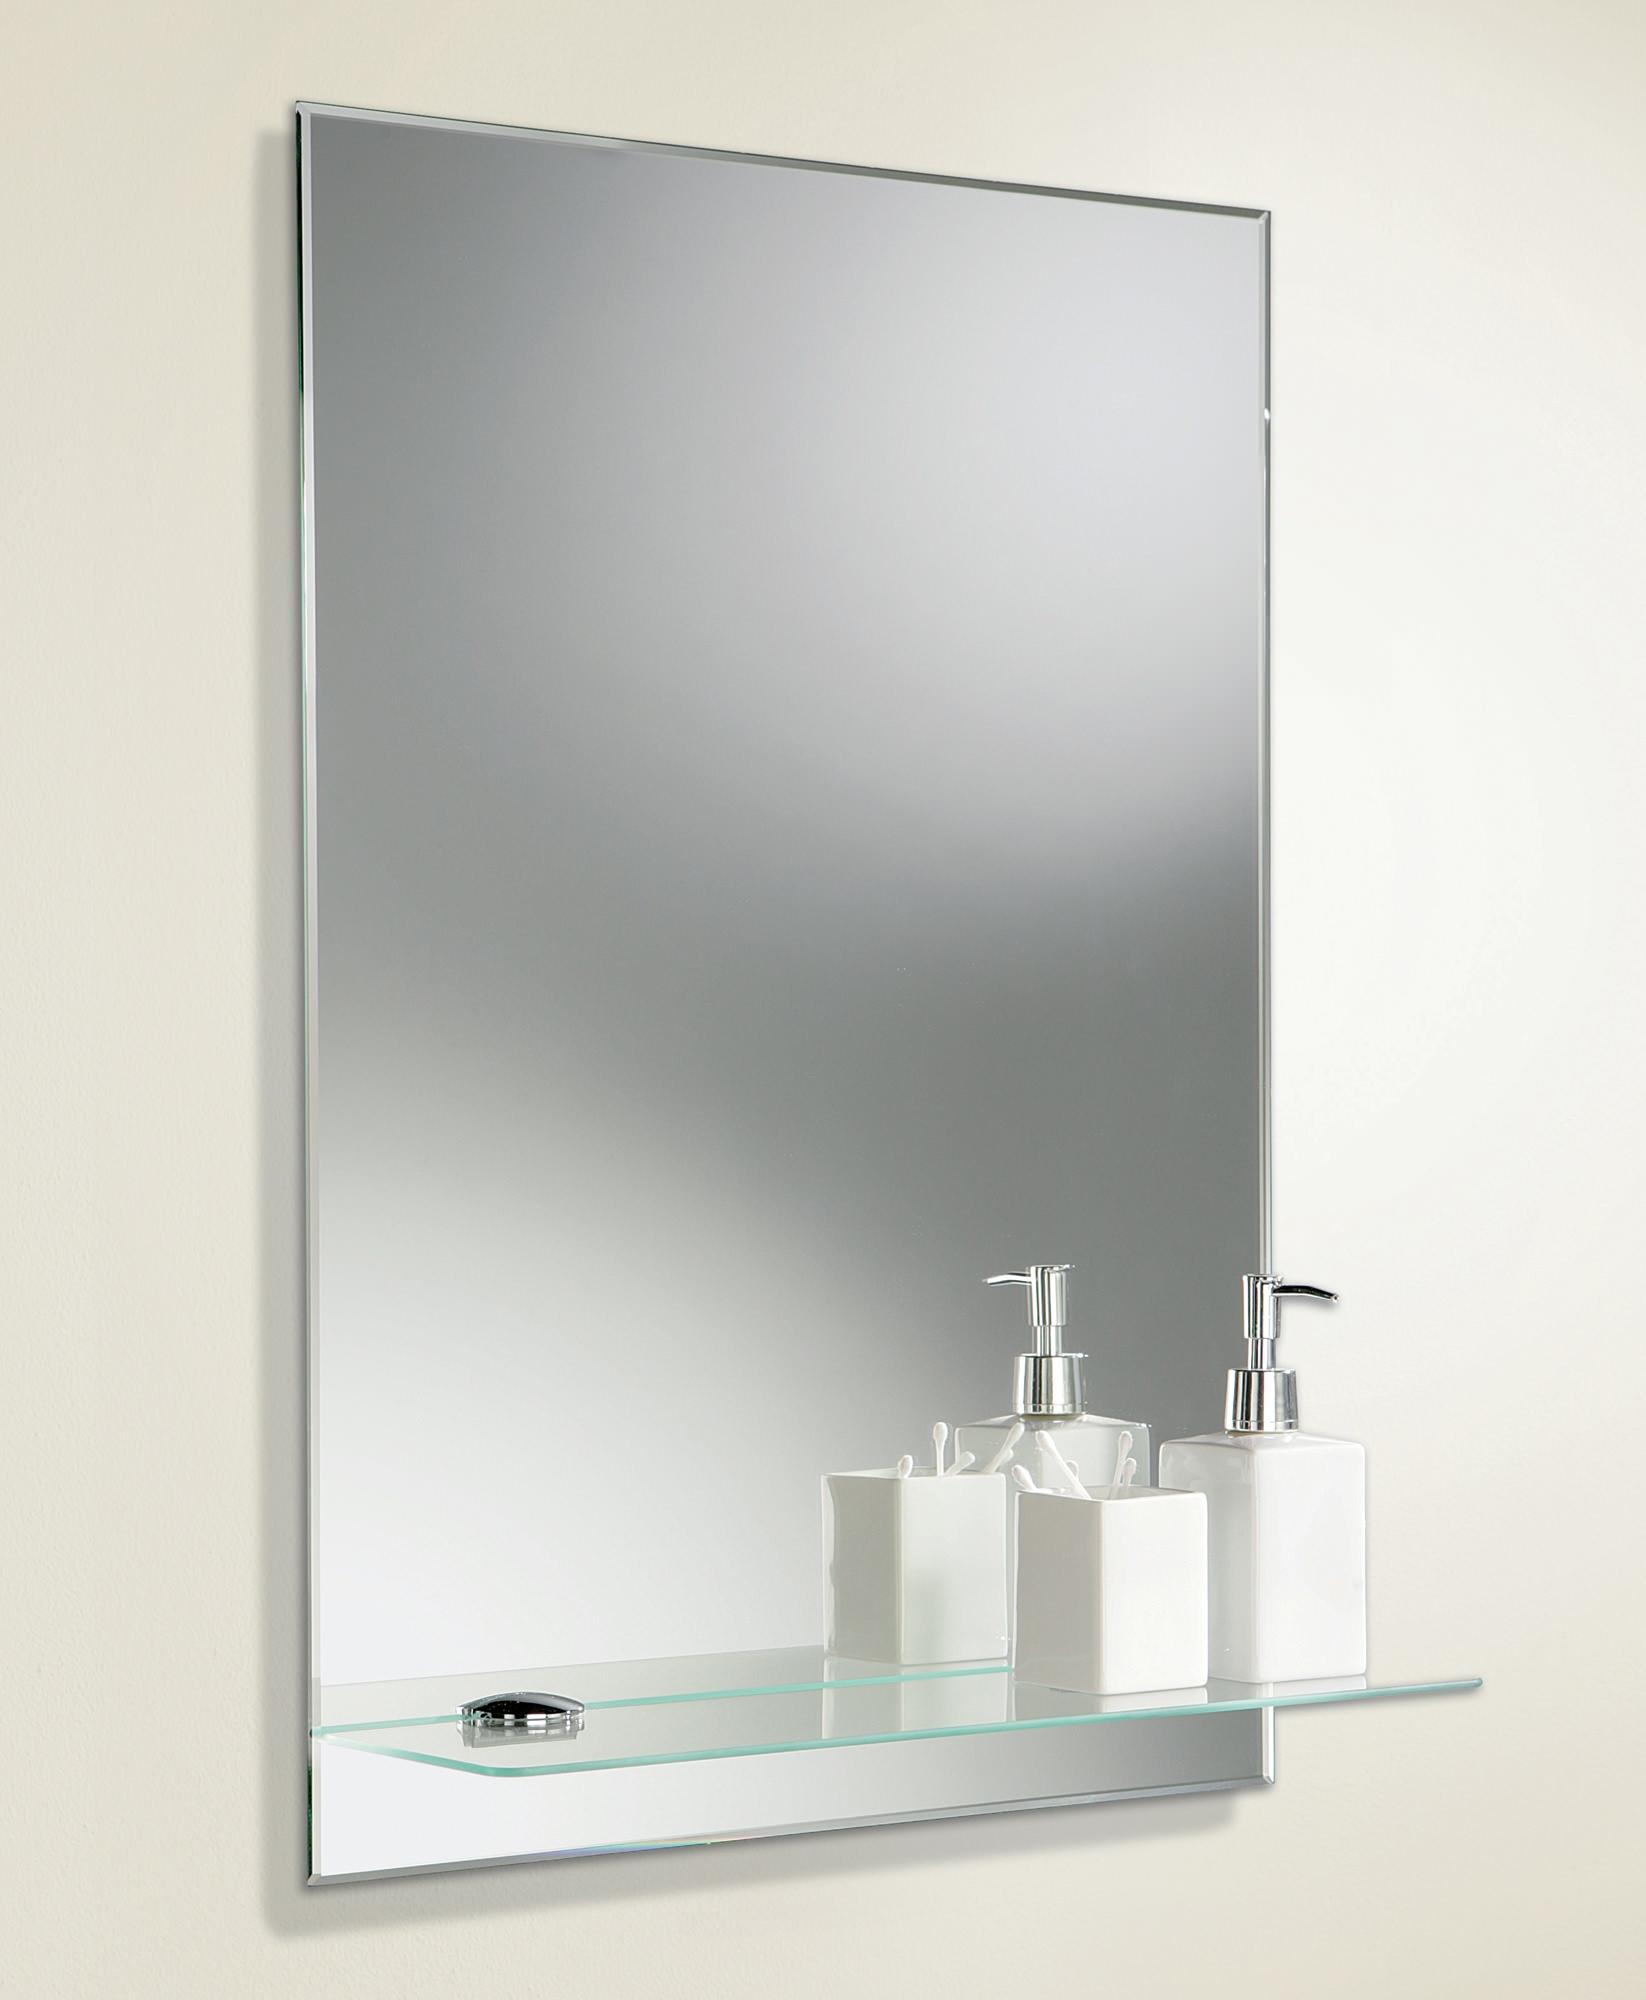 Bevelled Bathroom Mirror With Shelf